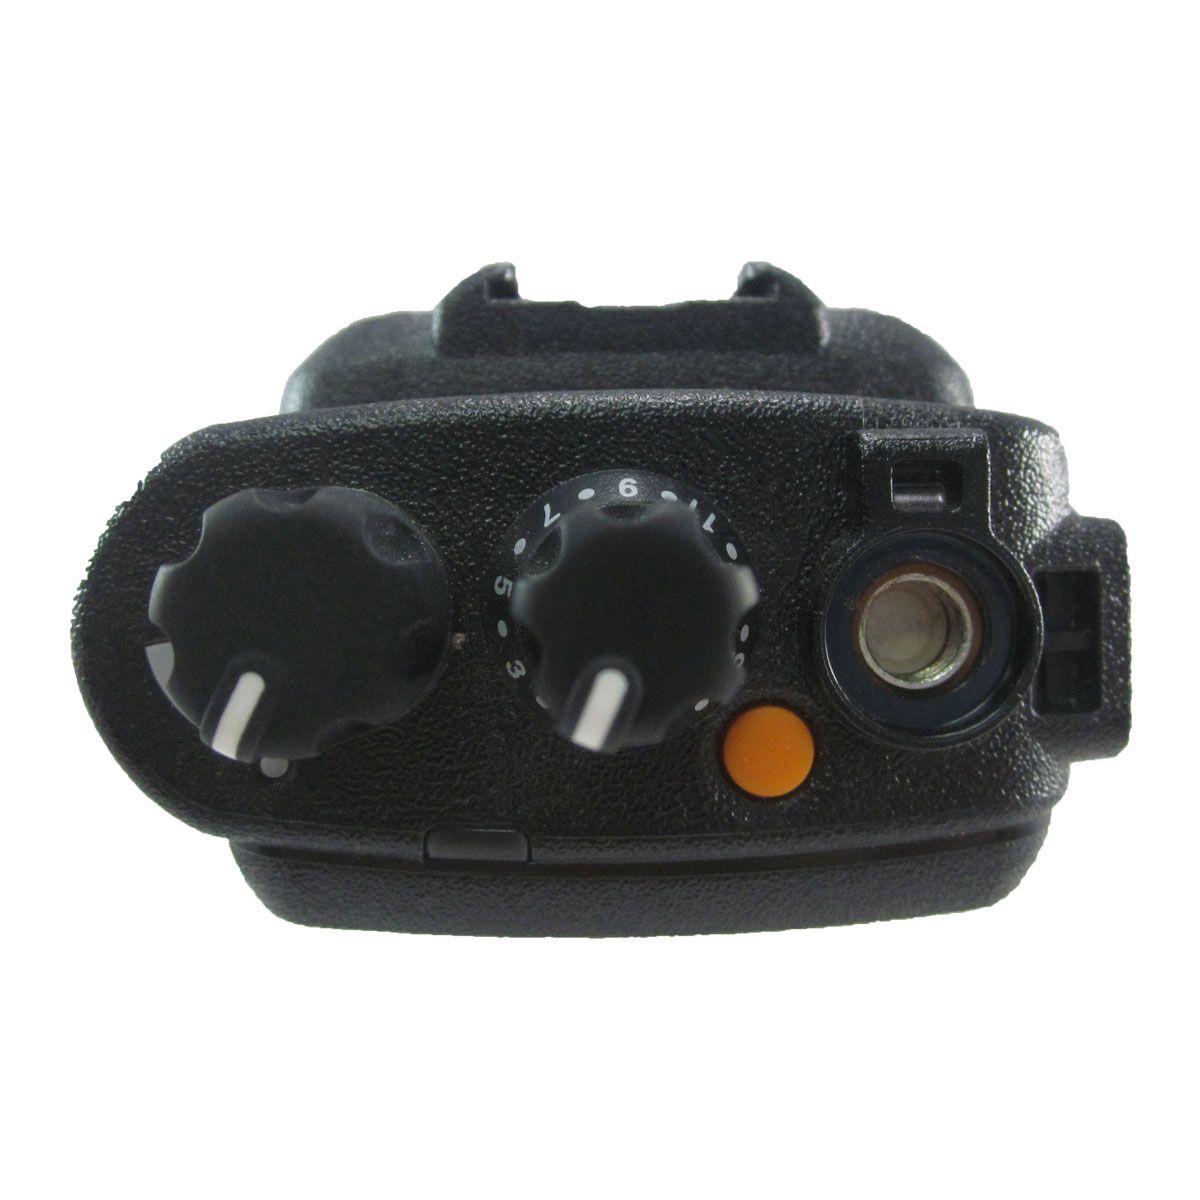 Radio Motorola DGP8050 Digital LAH56RDC9KA1AN UHF 403-527 MHz